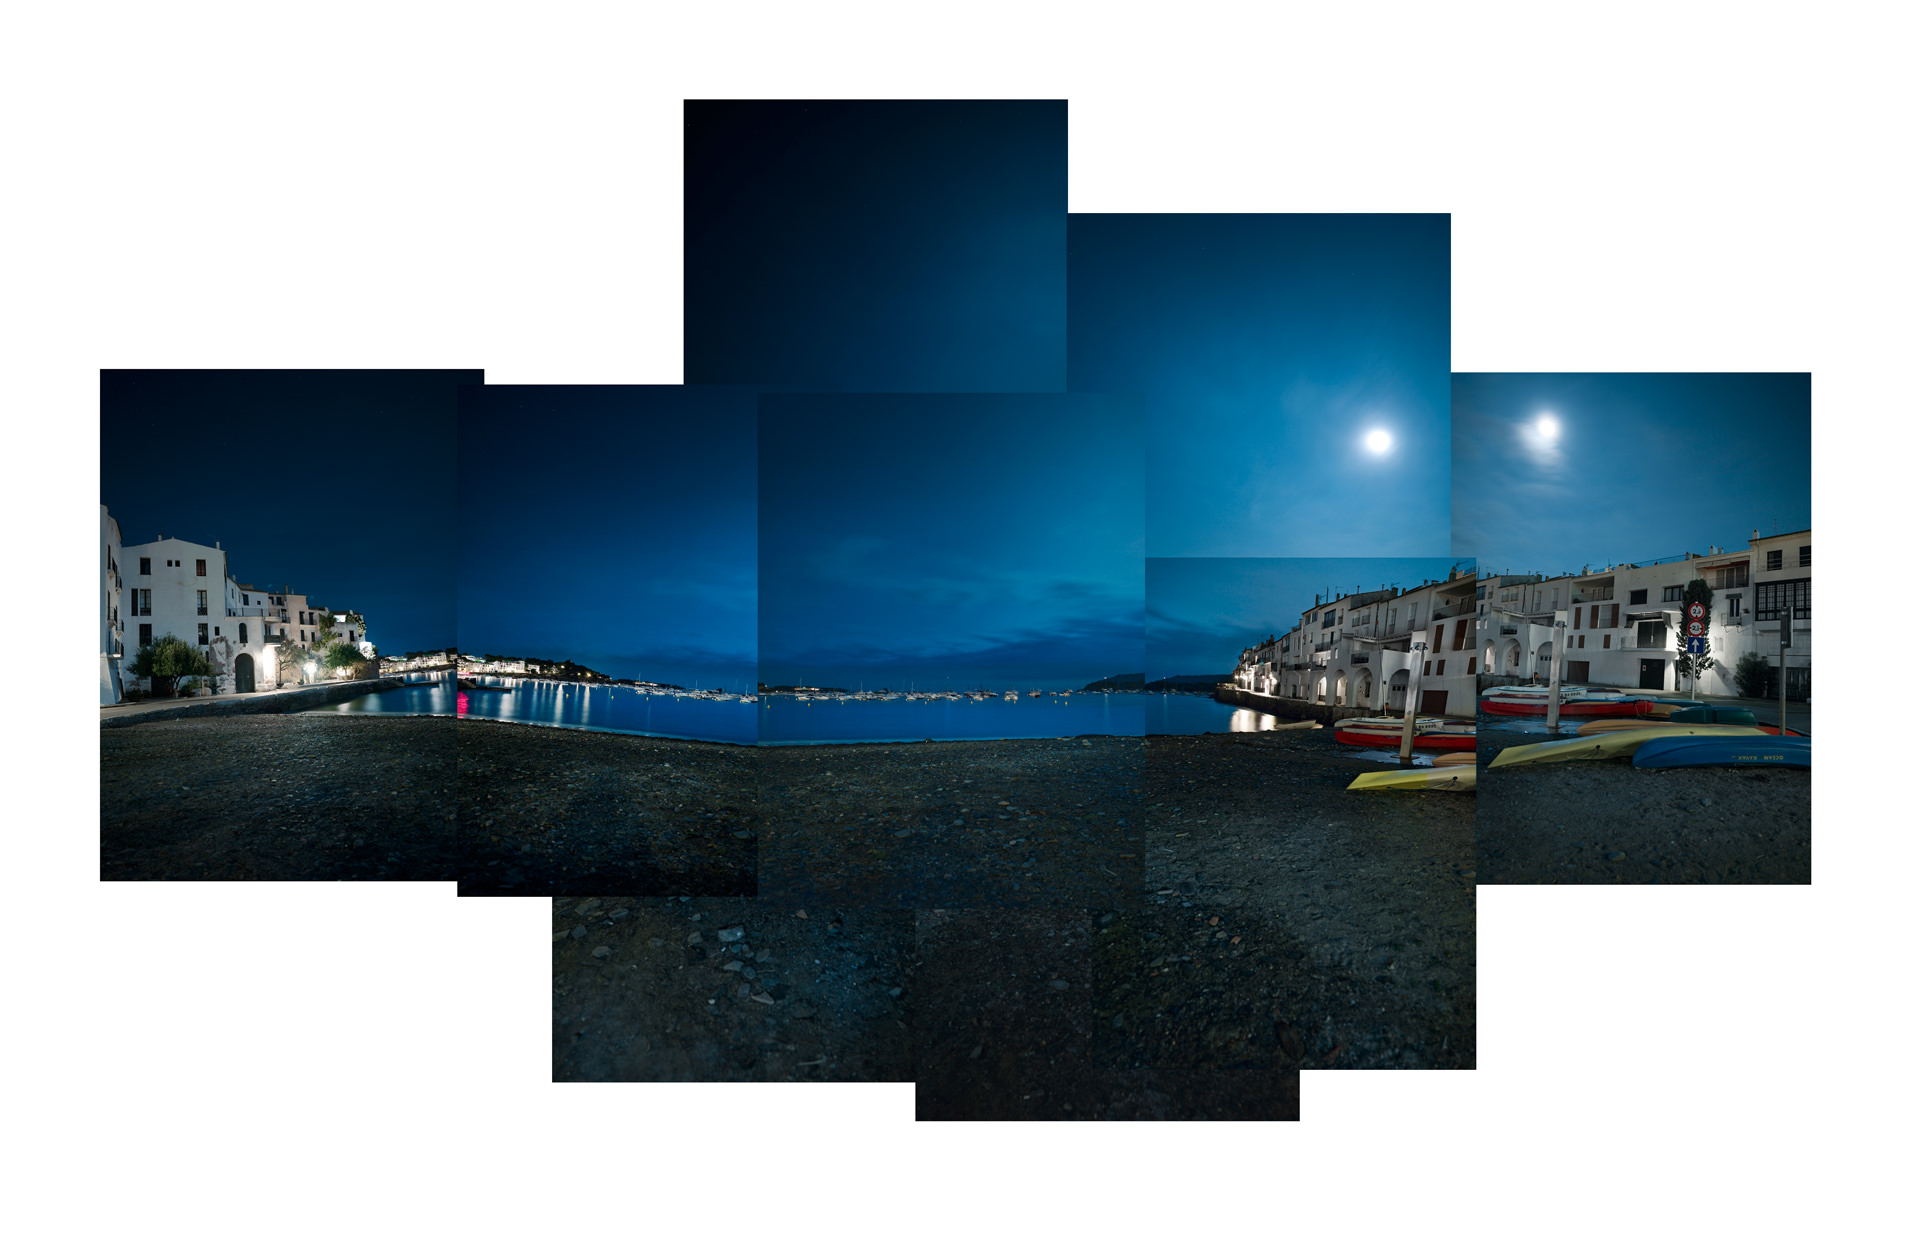 ©ankeluckmann638, ADAC, Reisemagazin, beach, spain, costa brava, people, landscape